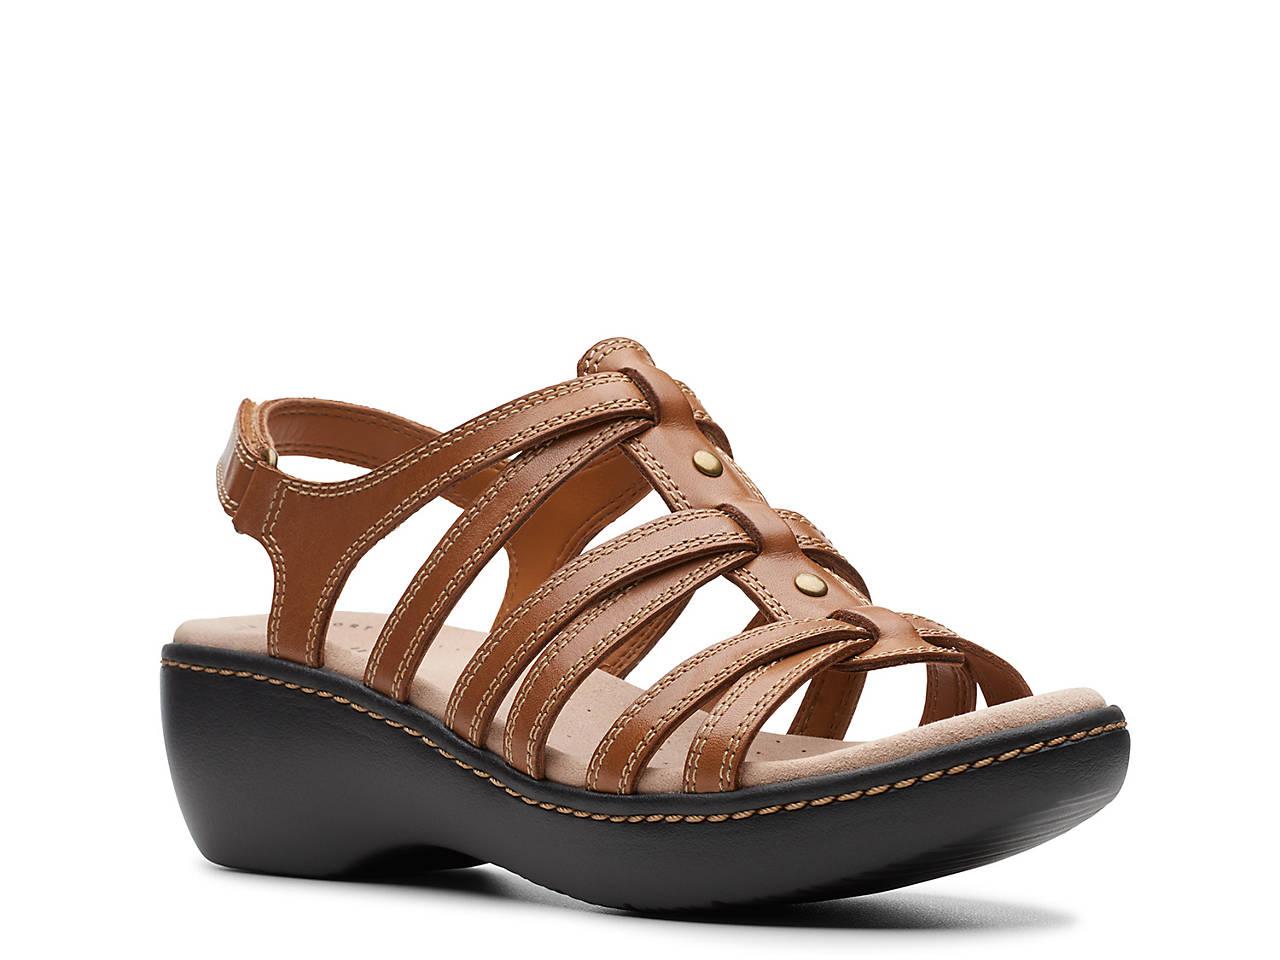 e1b6ff782f1 Clarks Delana Curve Wedge Sandal Women s Shoes